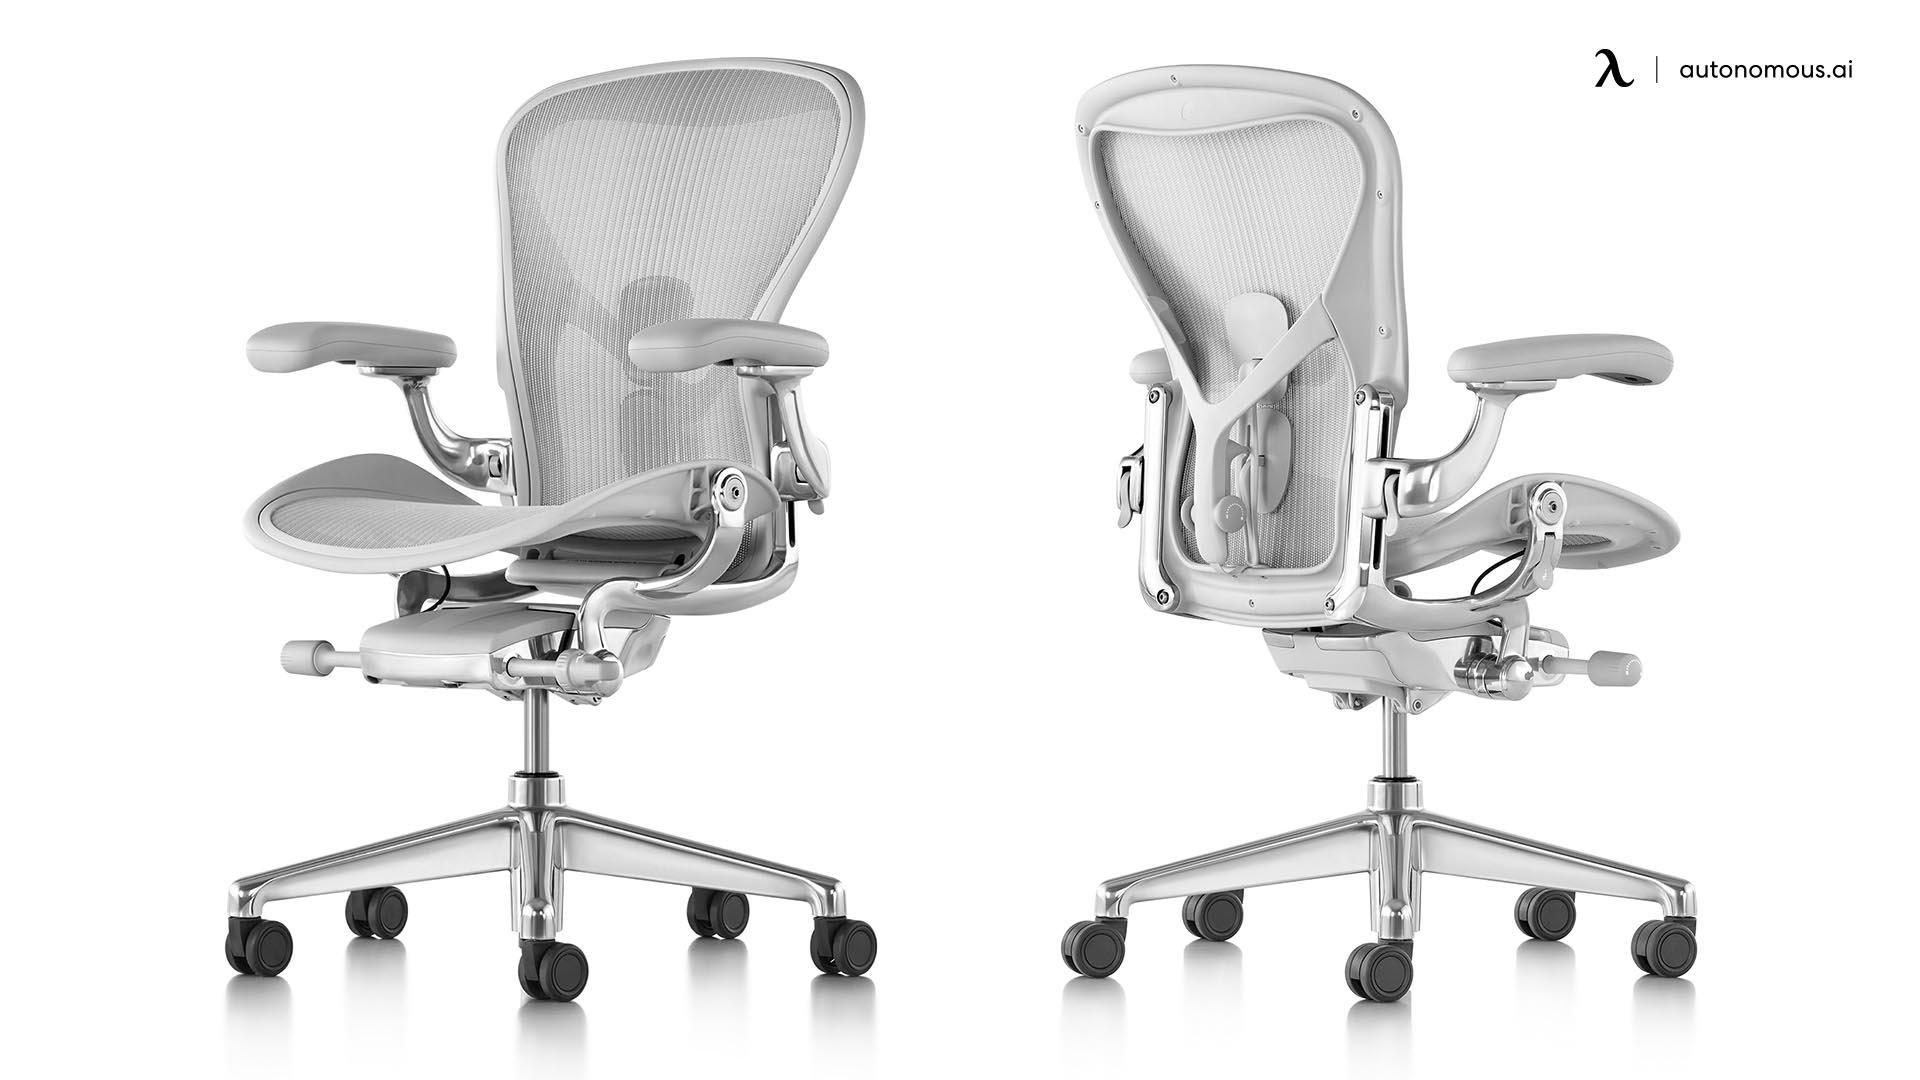 Aeron Ergonomic Graphite Chair by Herman Miller